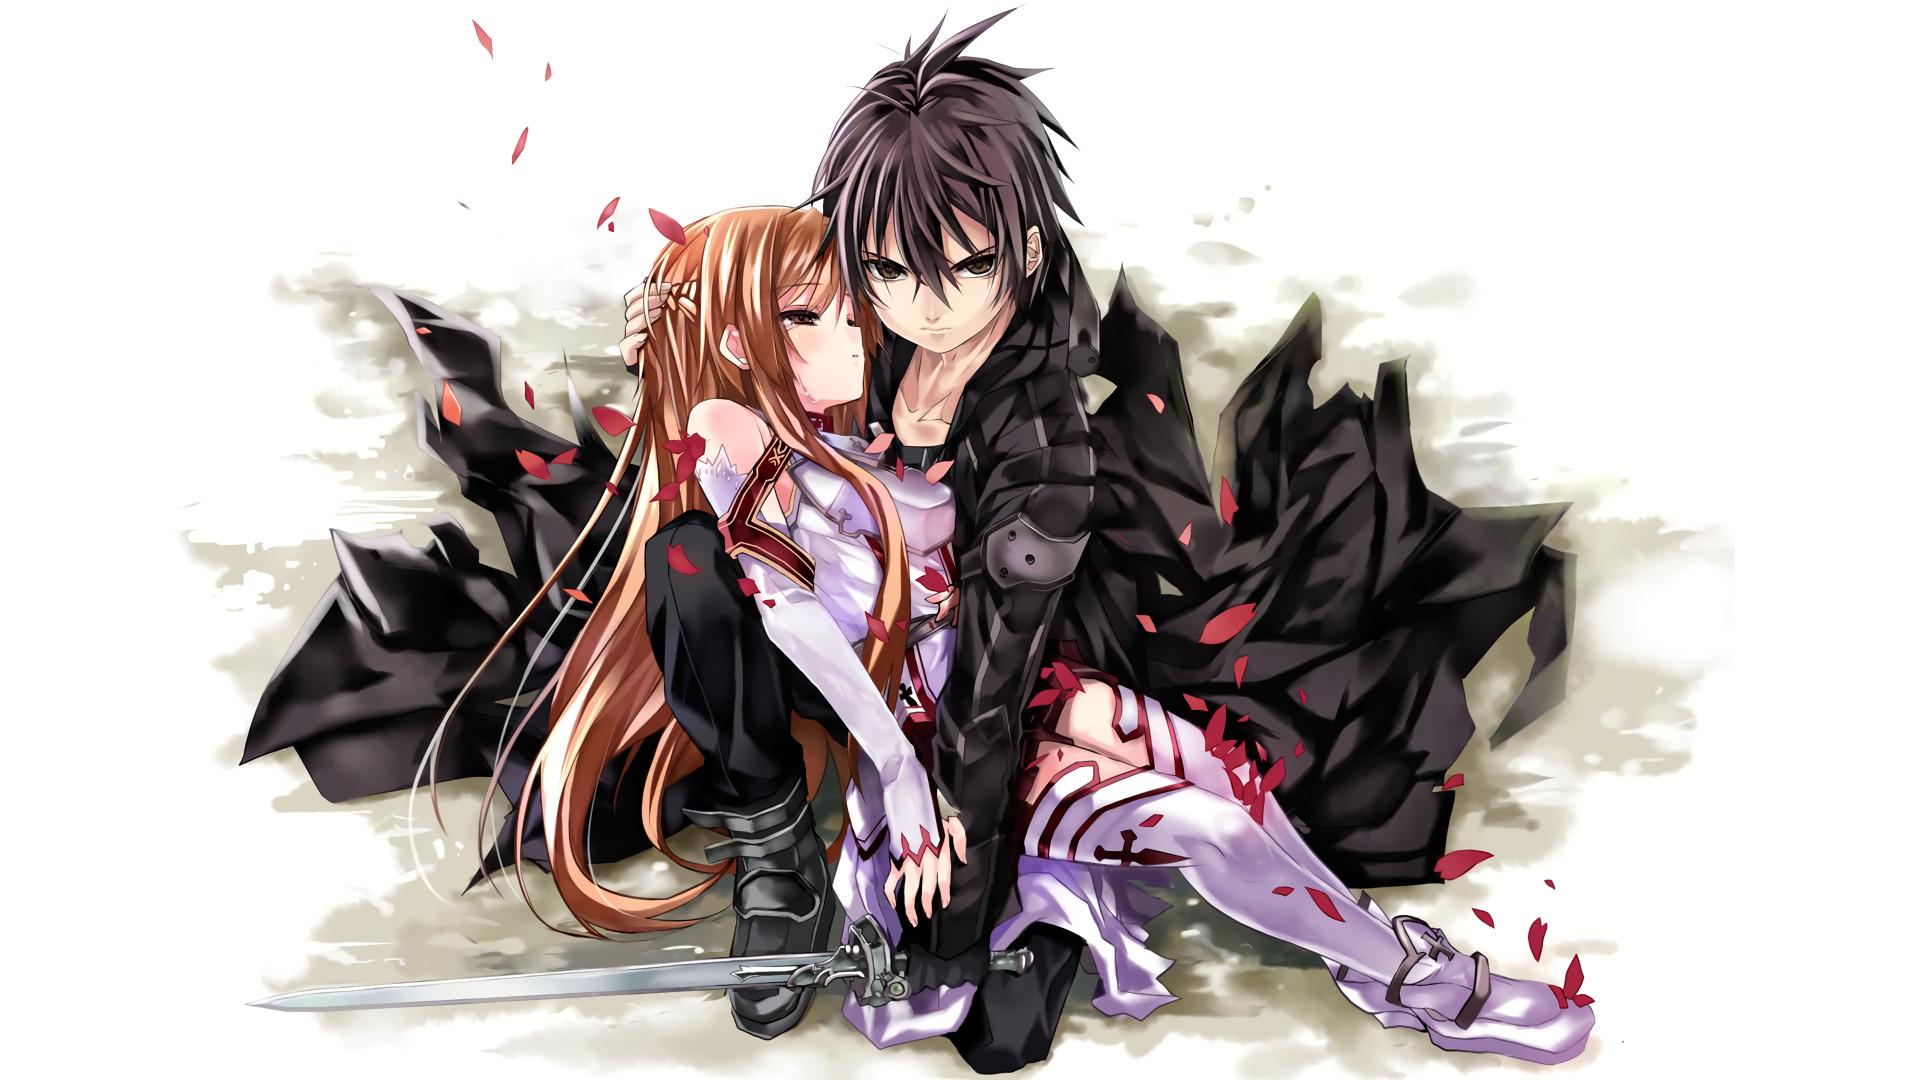 HD Wallpaper   Background ID:294346. Anime Sword Art Online